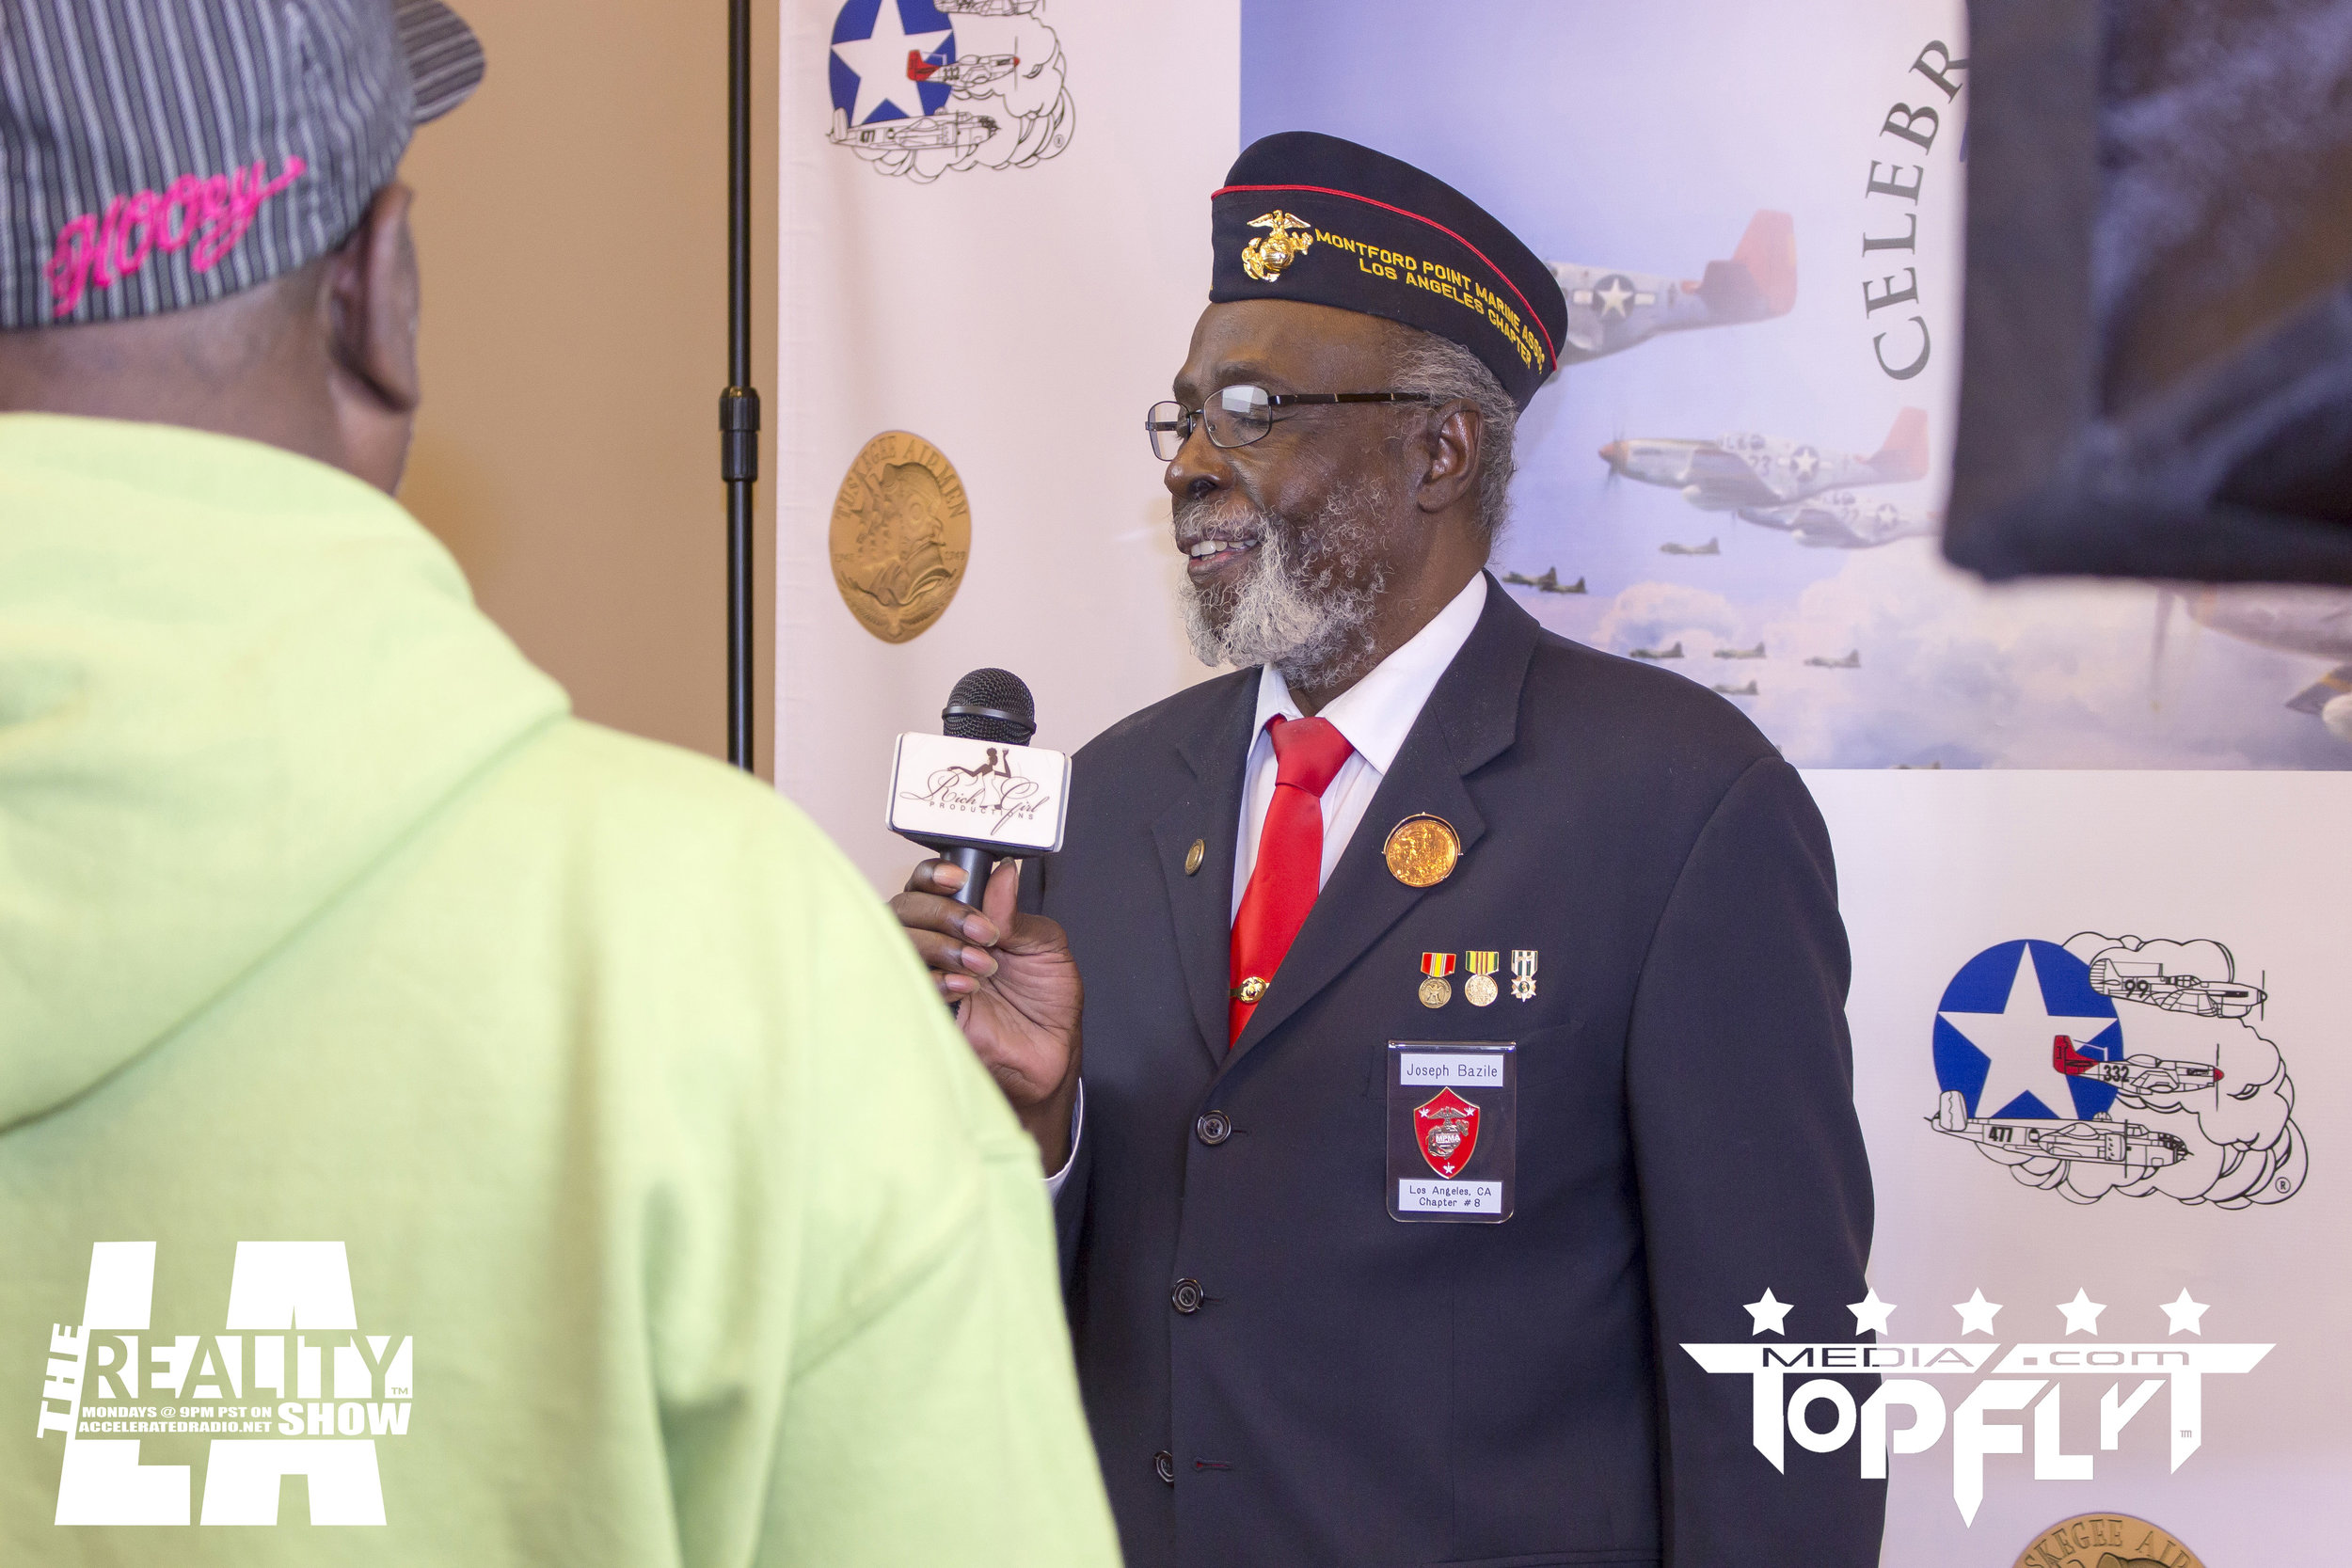 The Reality Show LA - Tuskegee Airmen 75th Anniversary VIP Reception_2.jpg